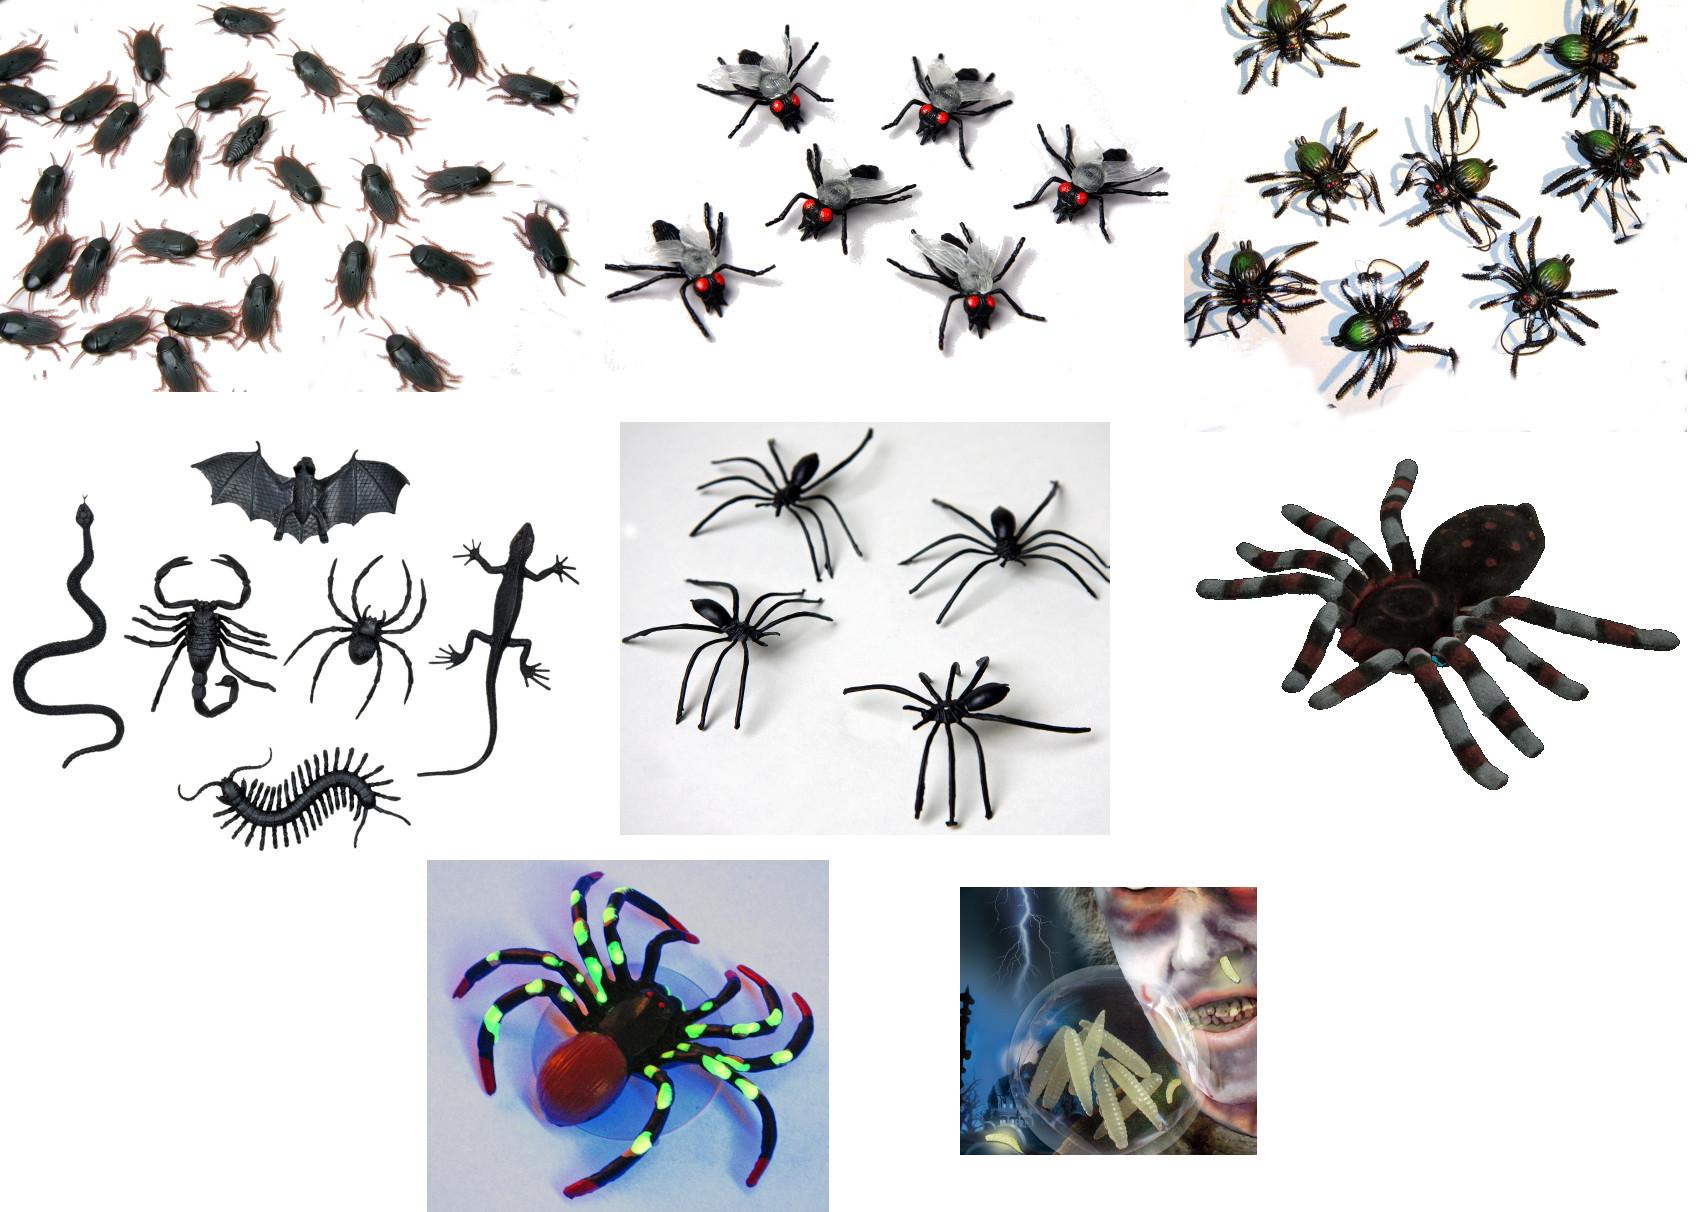 tiere gruseltiere deko halloween party spinnen kakerlaken fliegen maden ebay. Black Bedroom Furniture Sets. Home Design Ideas